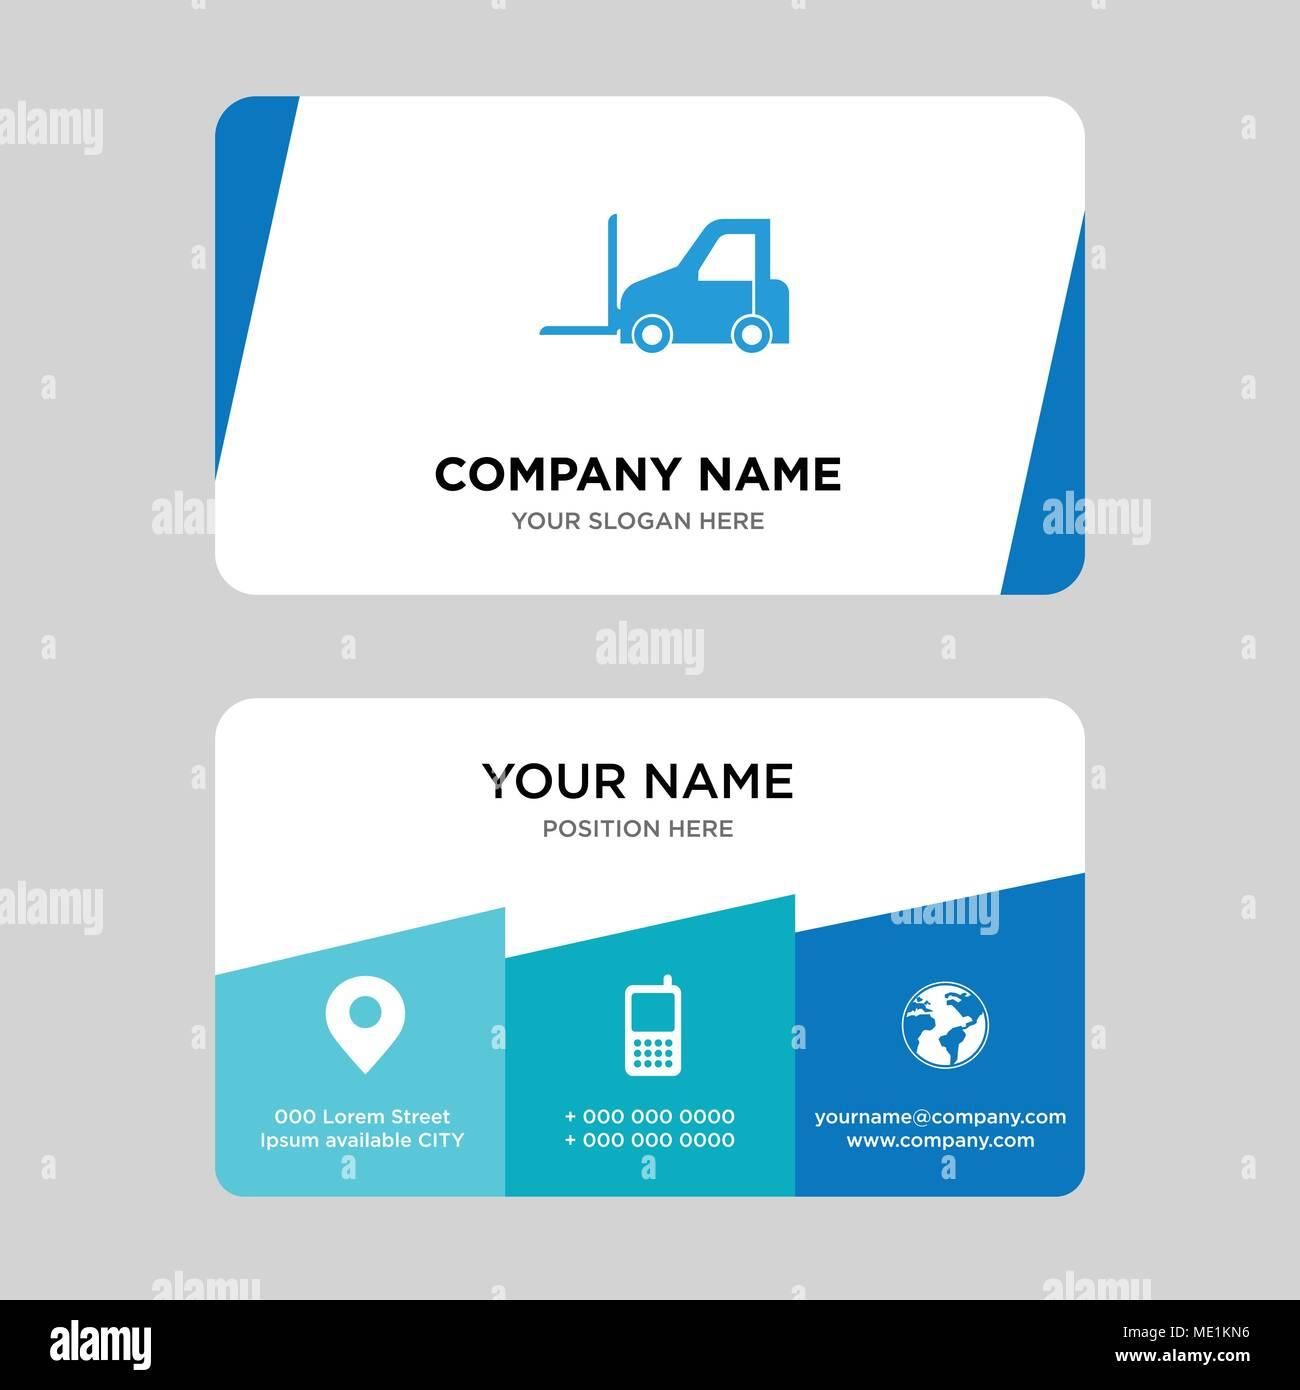 Id Logistics Stock Photos & Id Logistics Stock Images - Alamy